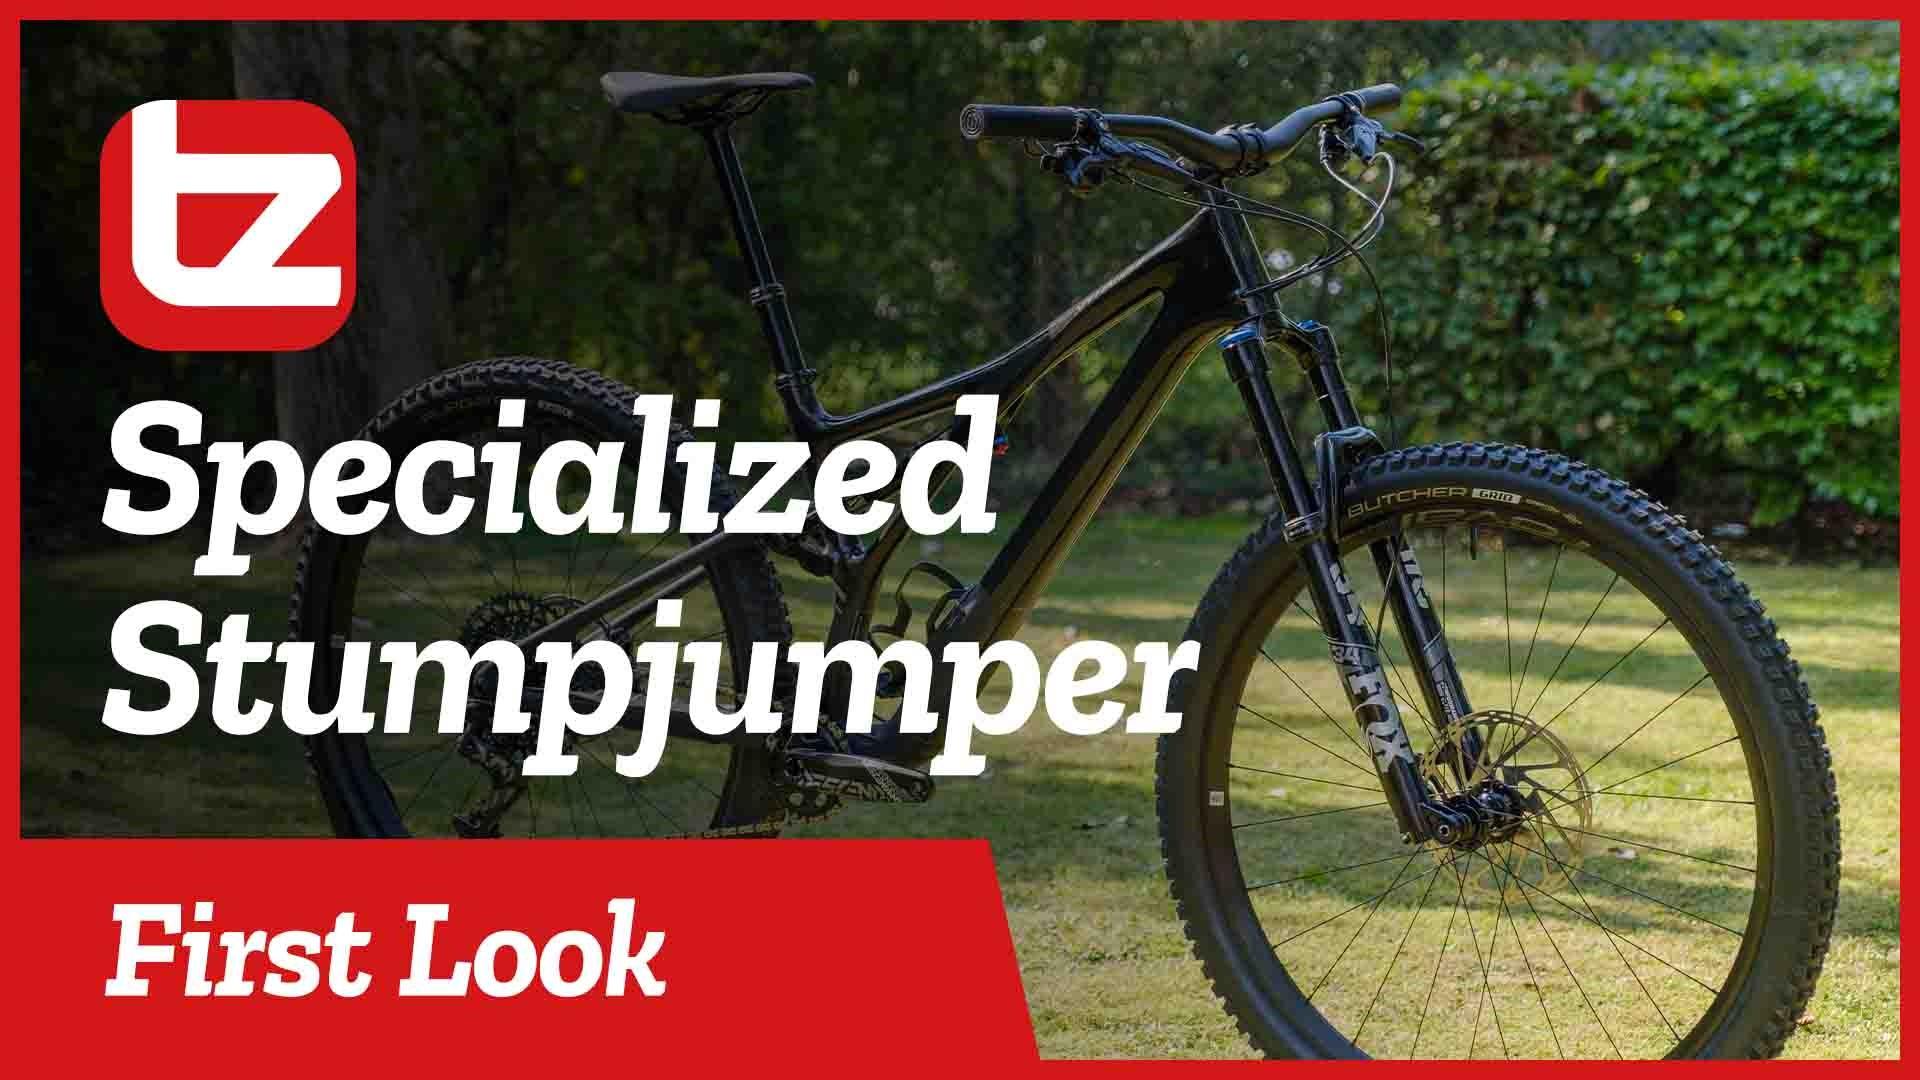 New Specialized Stumpjumper | The Best Gets Better | First Look | Tredz Bikes